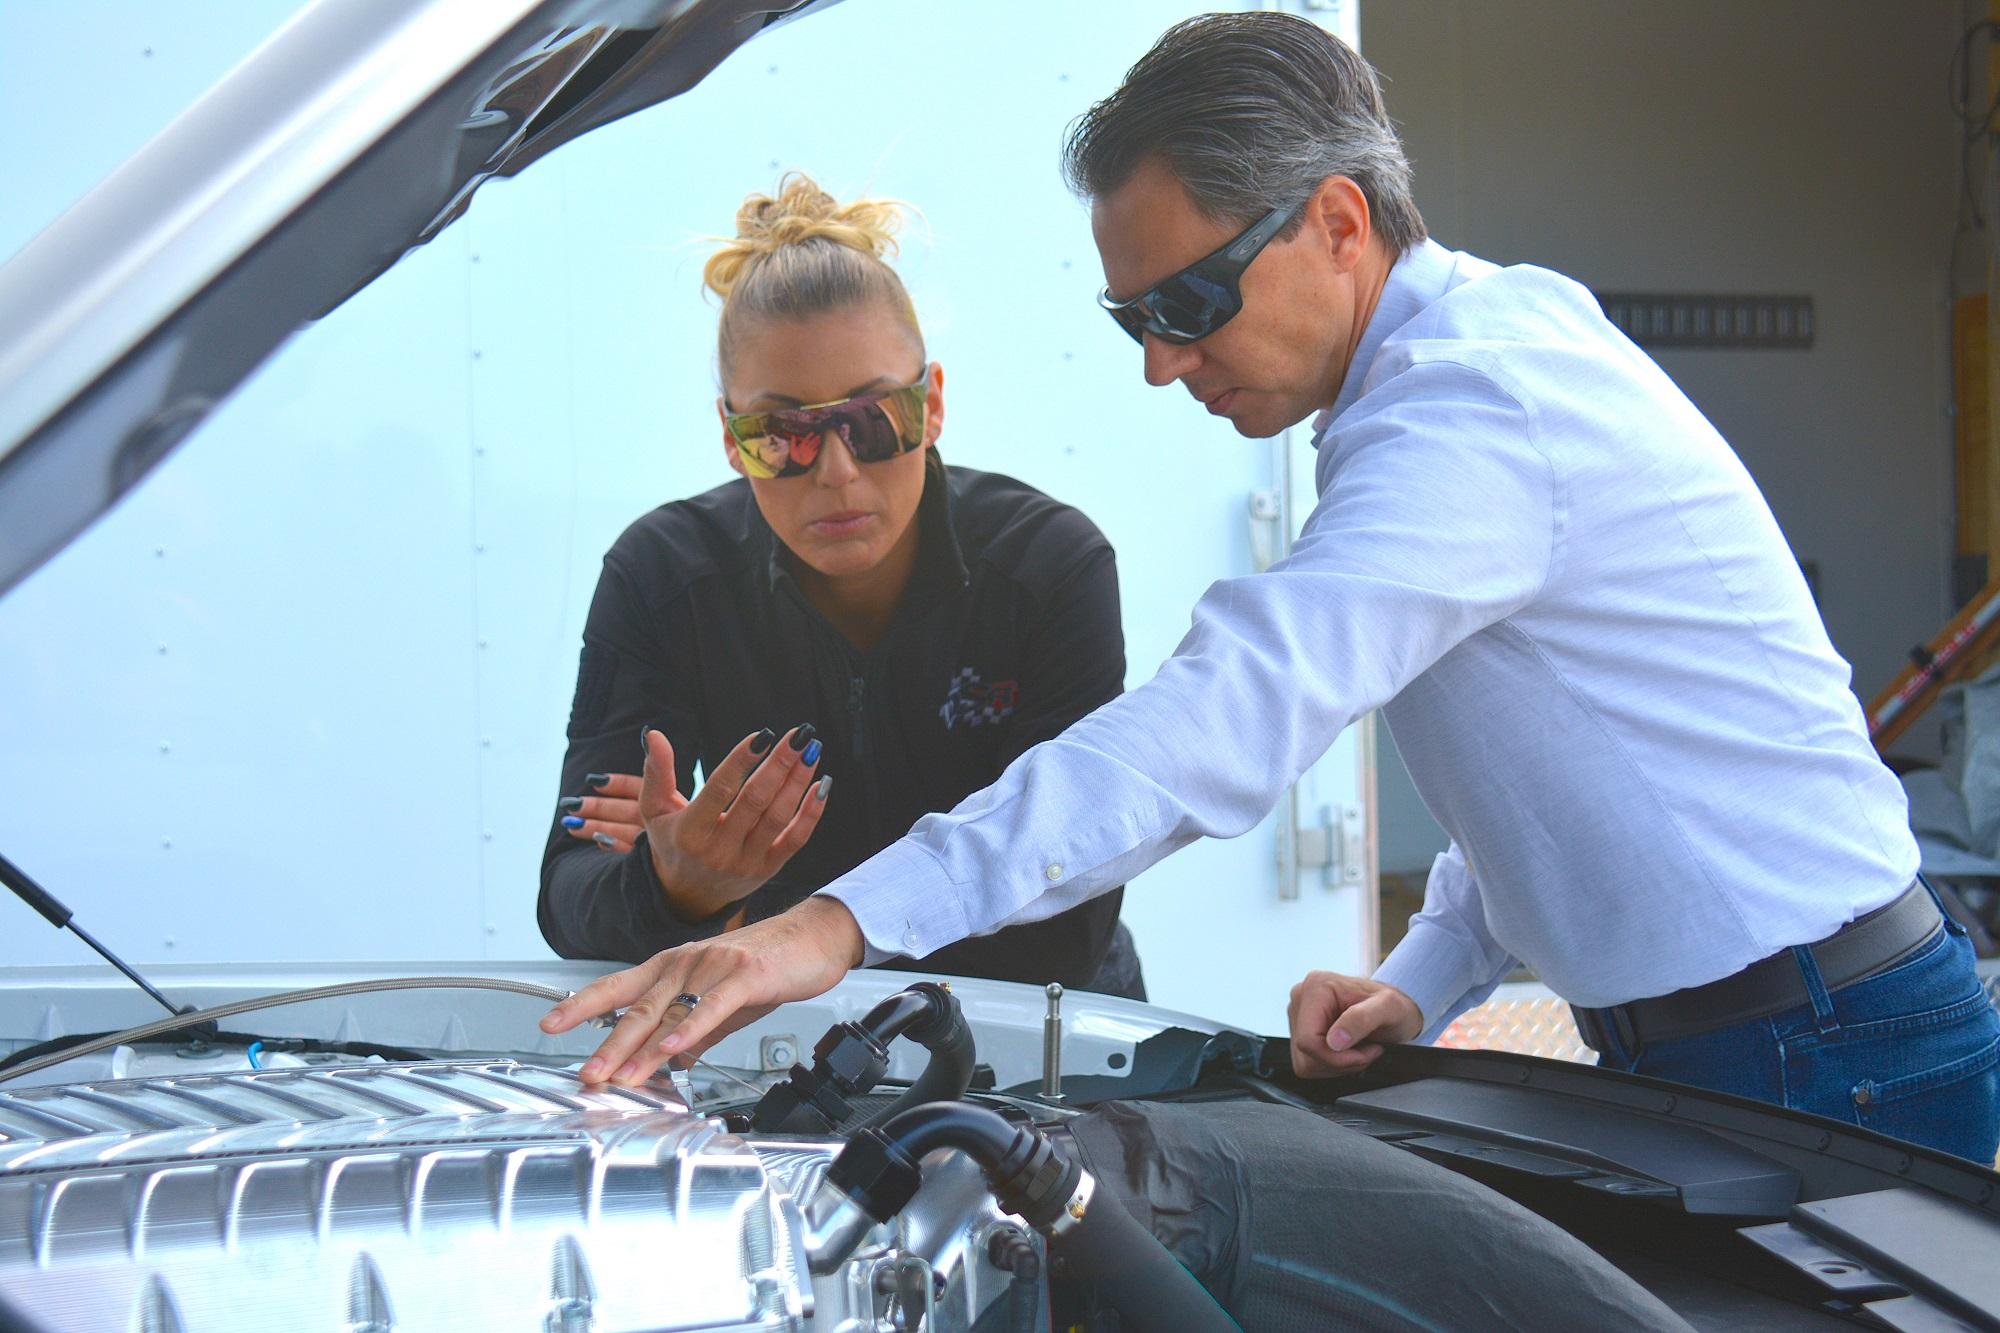 Leah Pruett working on her car